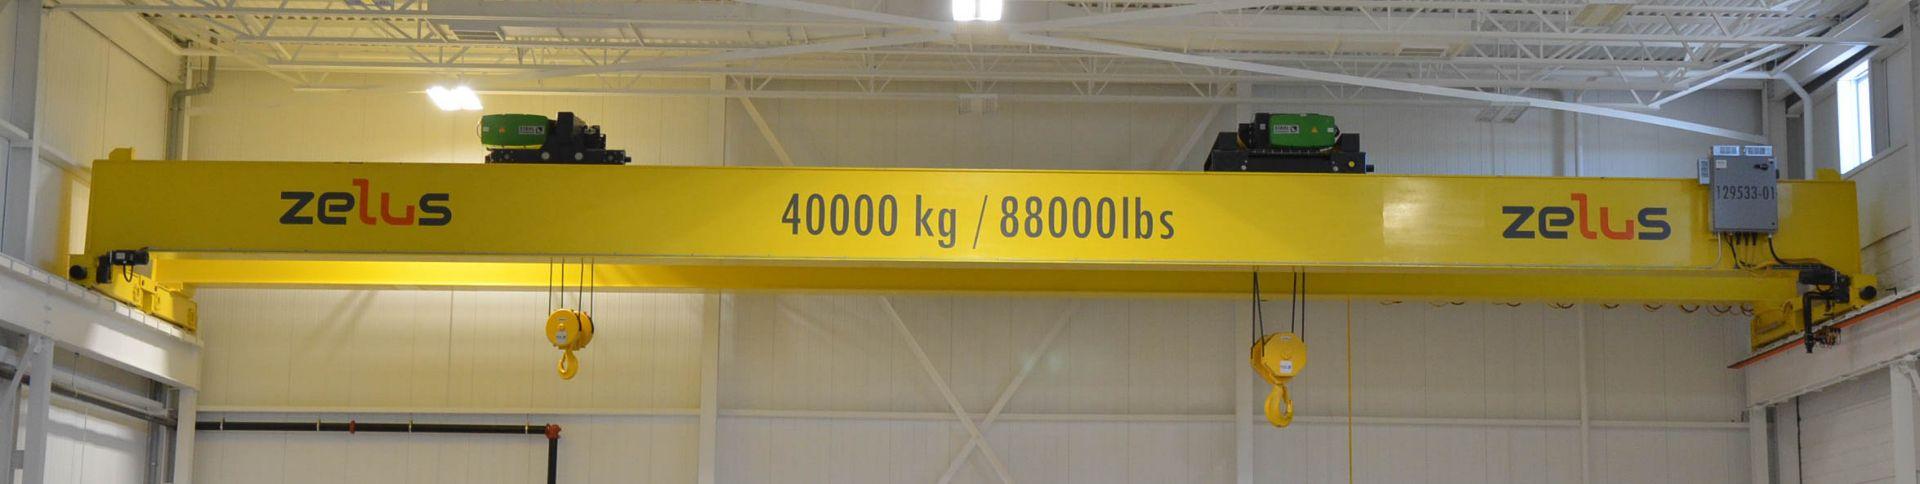 ZELUS (2020) 40TON CAPACITY DOUBLE GIRDER TOP-RUNNING OVERHEAD BRIDGE CRANE WITH APPROX. 68' SPAN,